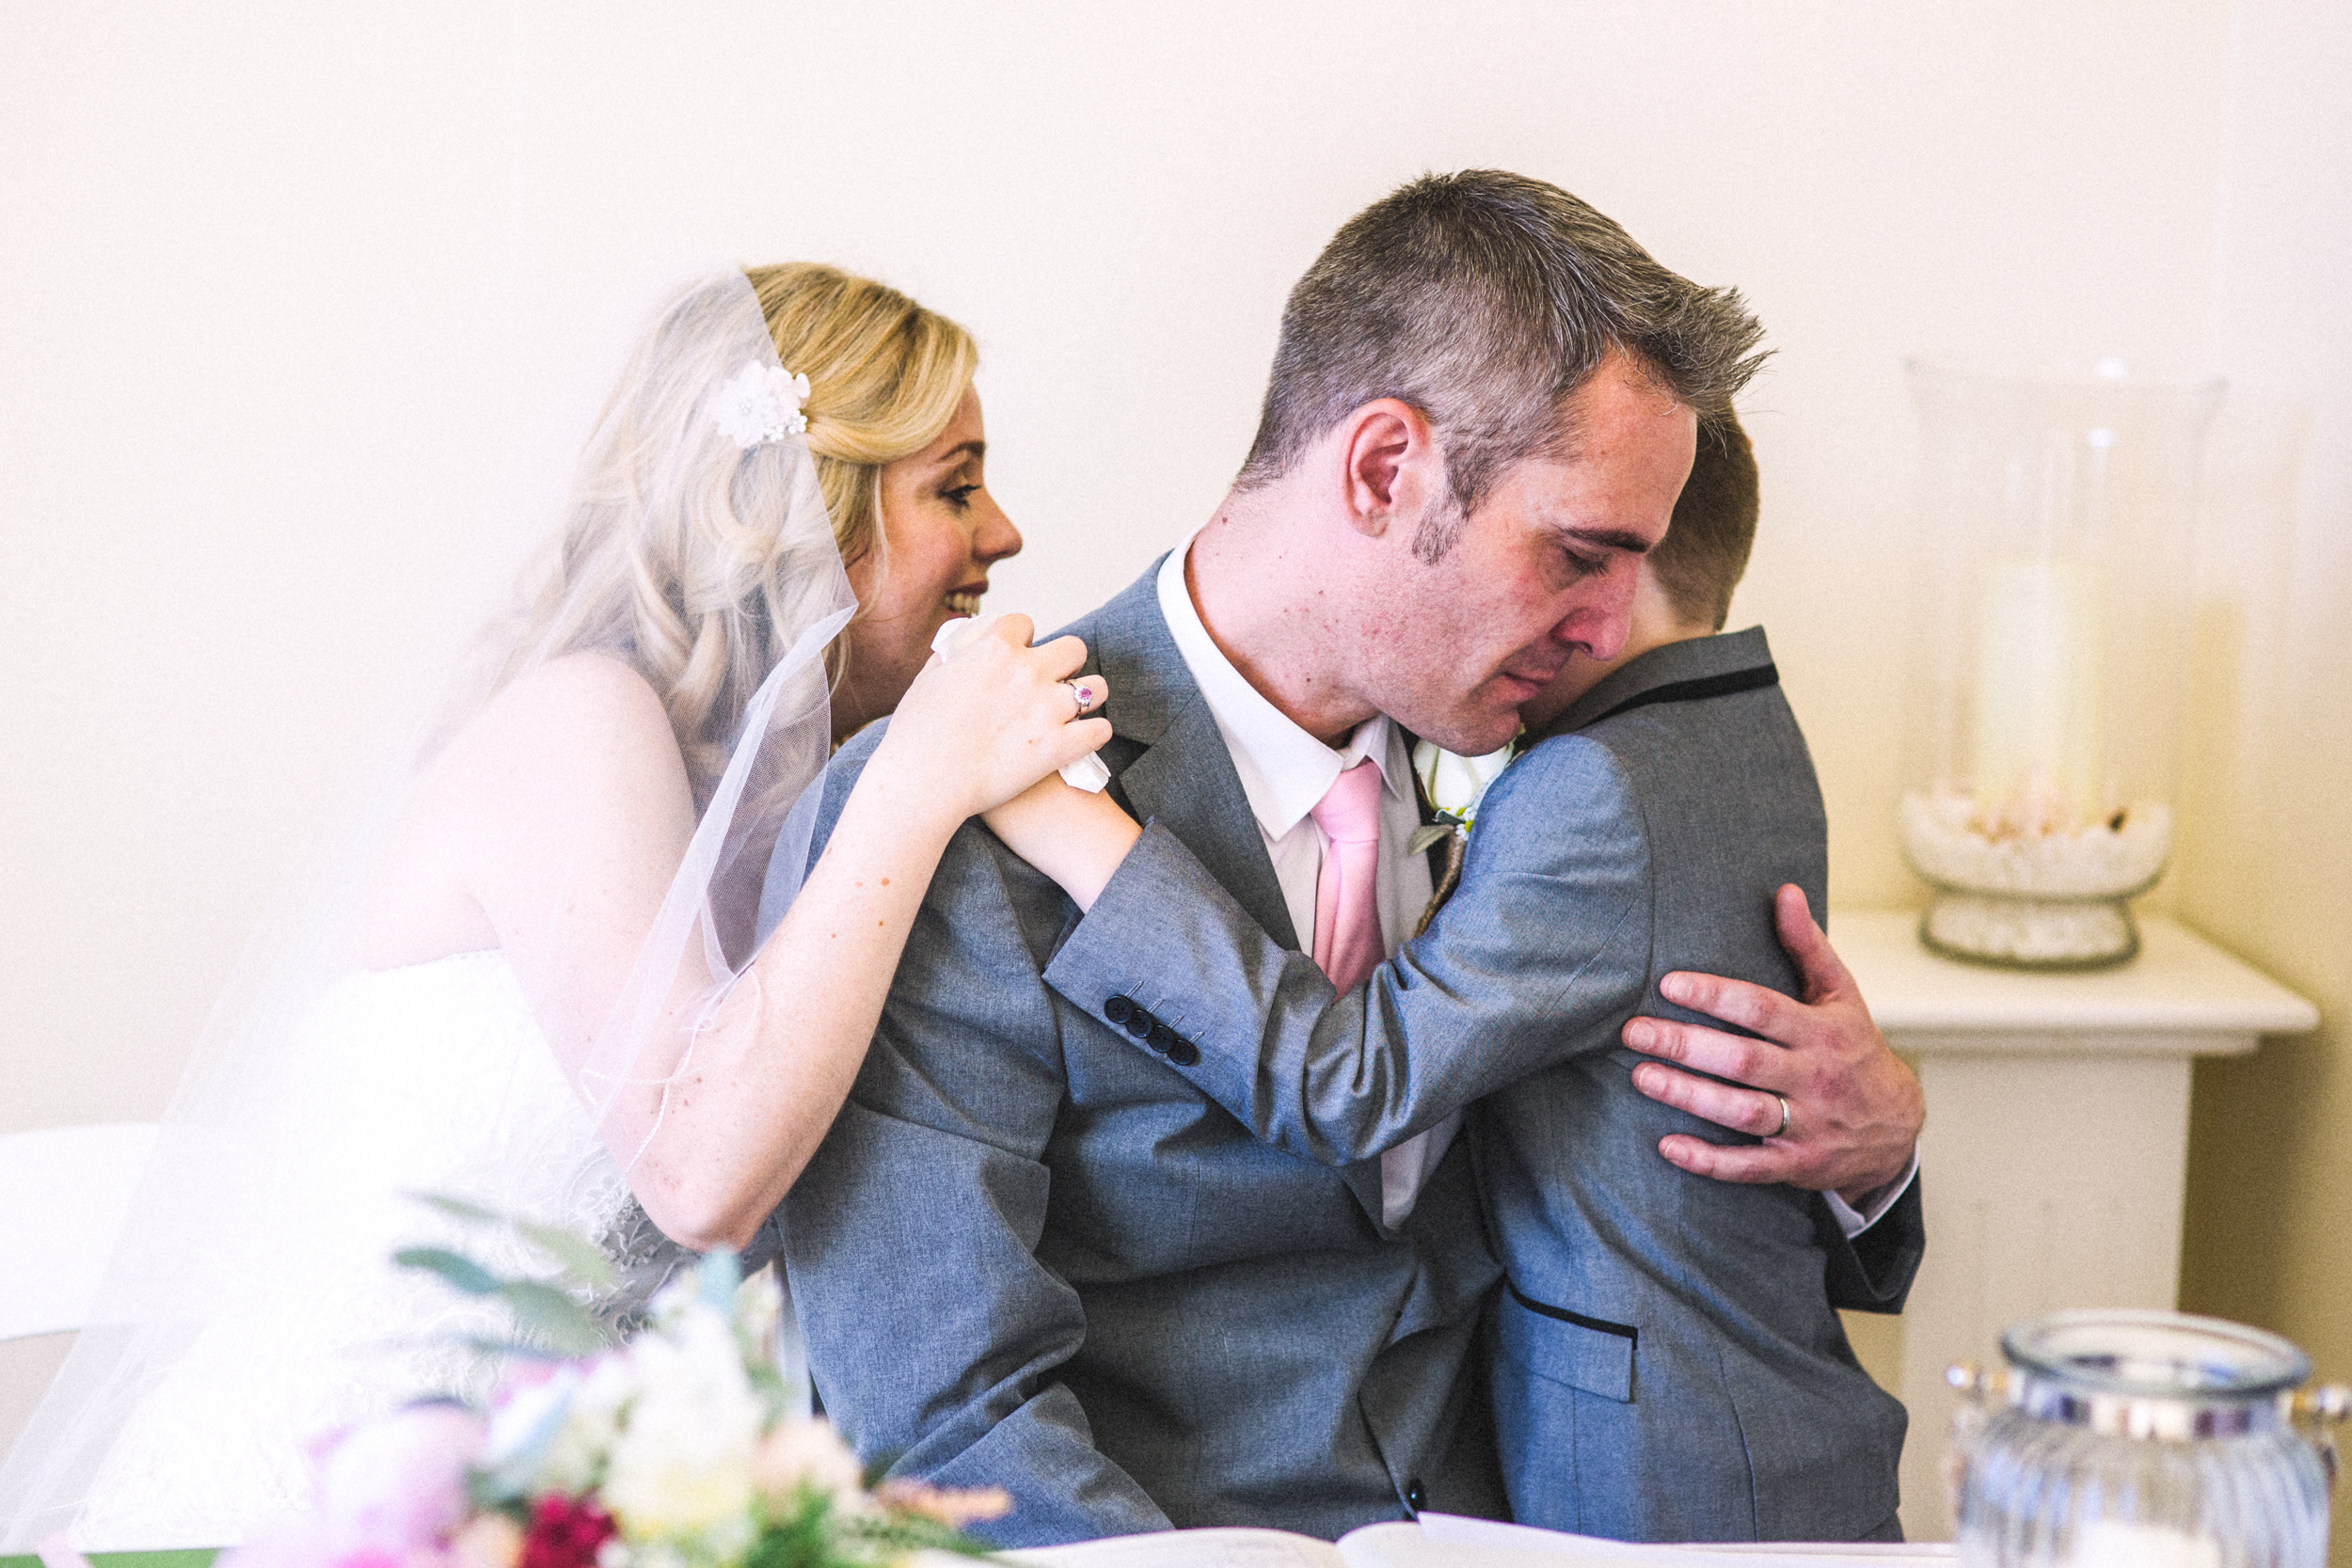 creative-wedding-photography-teesside-north-east-yorkshire-17.jpg